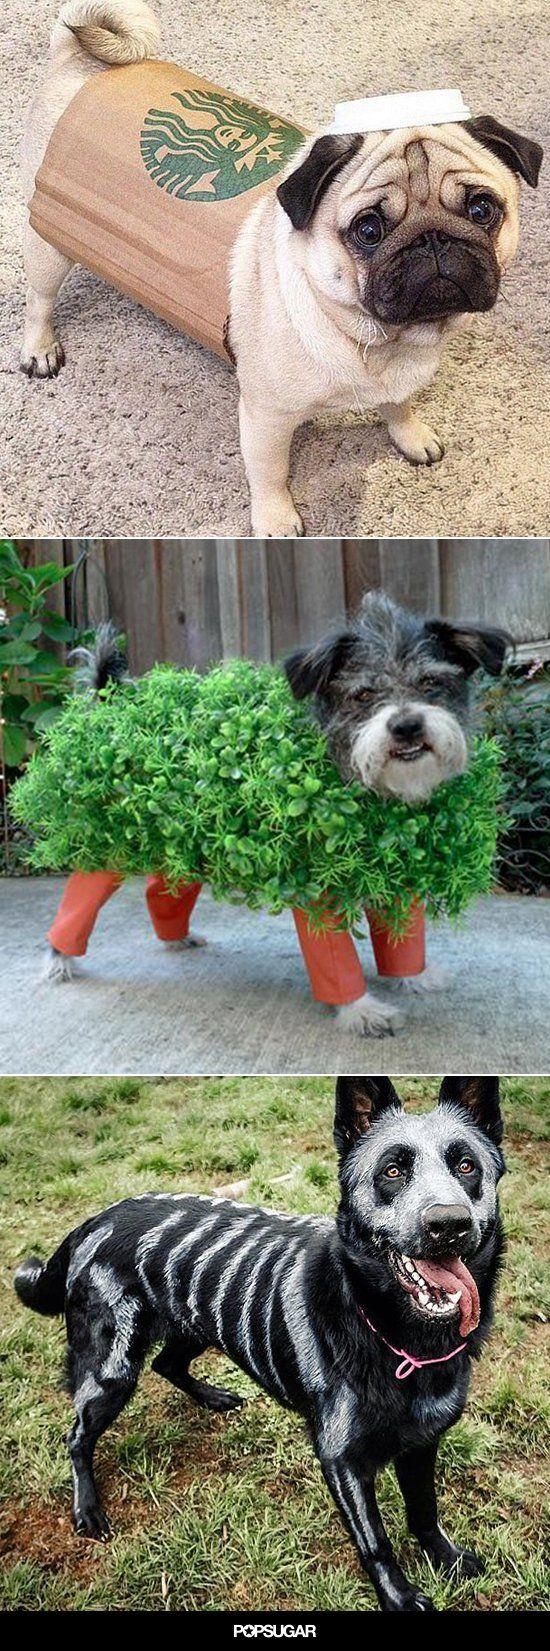 Best 20+ Chia pet ideas on Pinterest